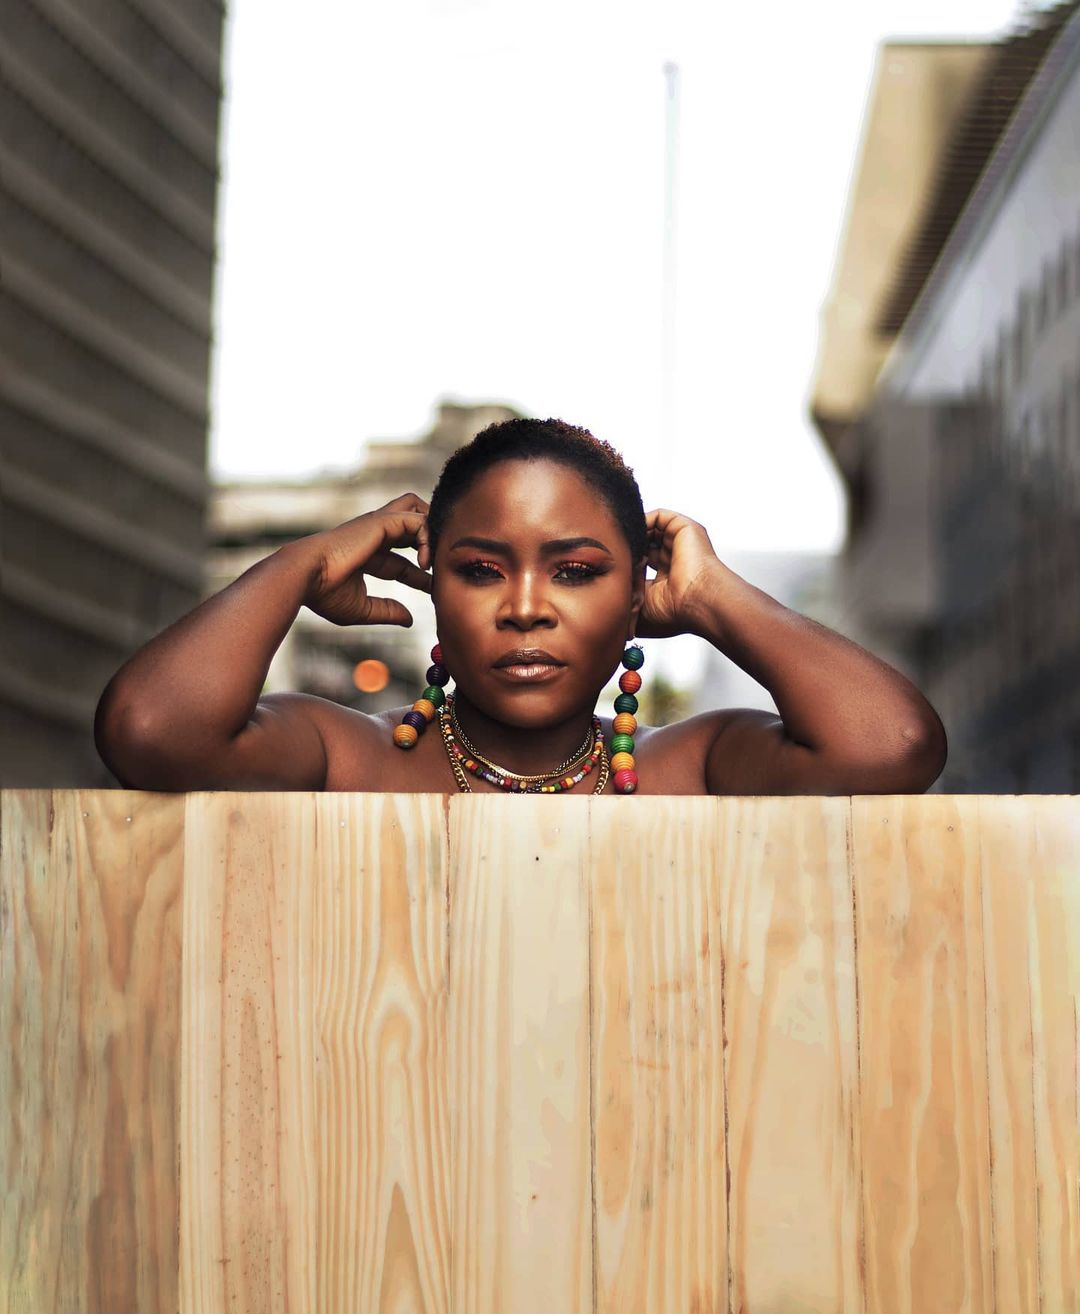 Singer Omawunmi says